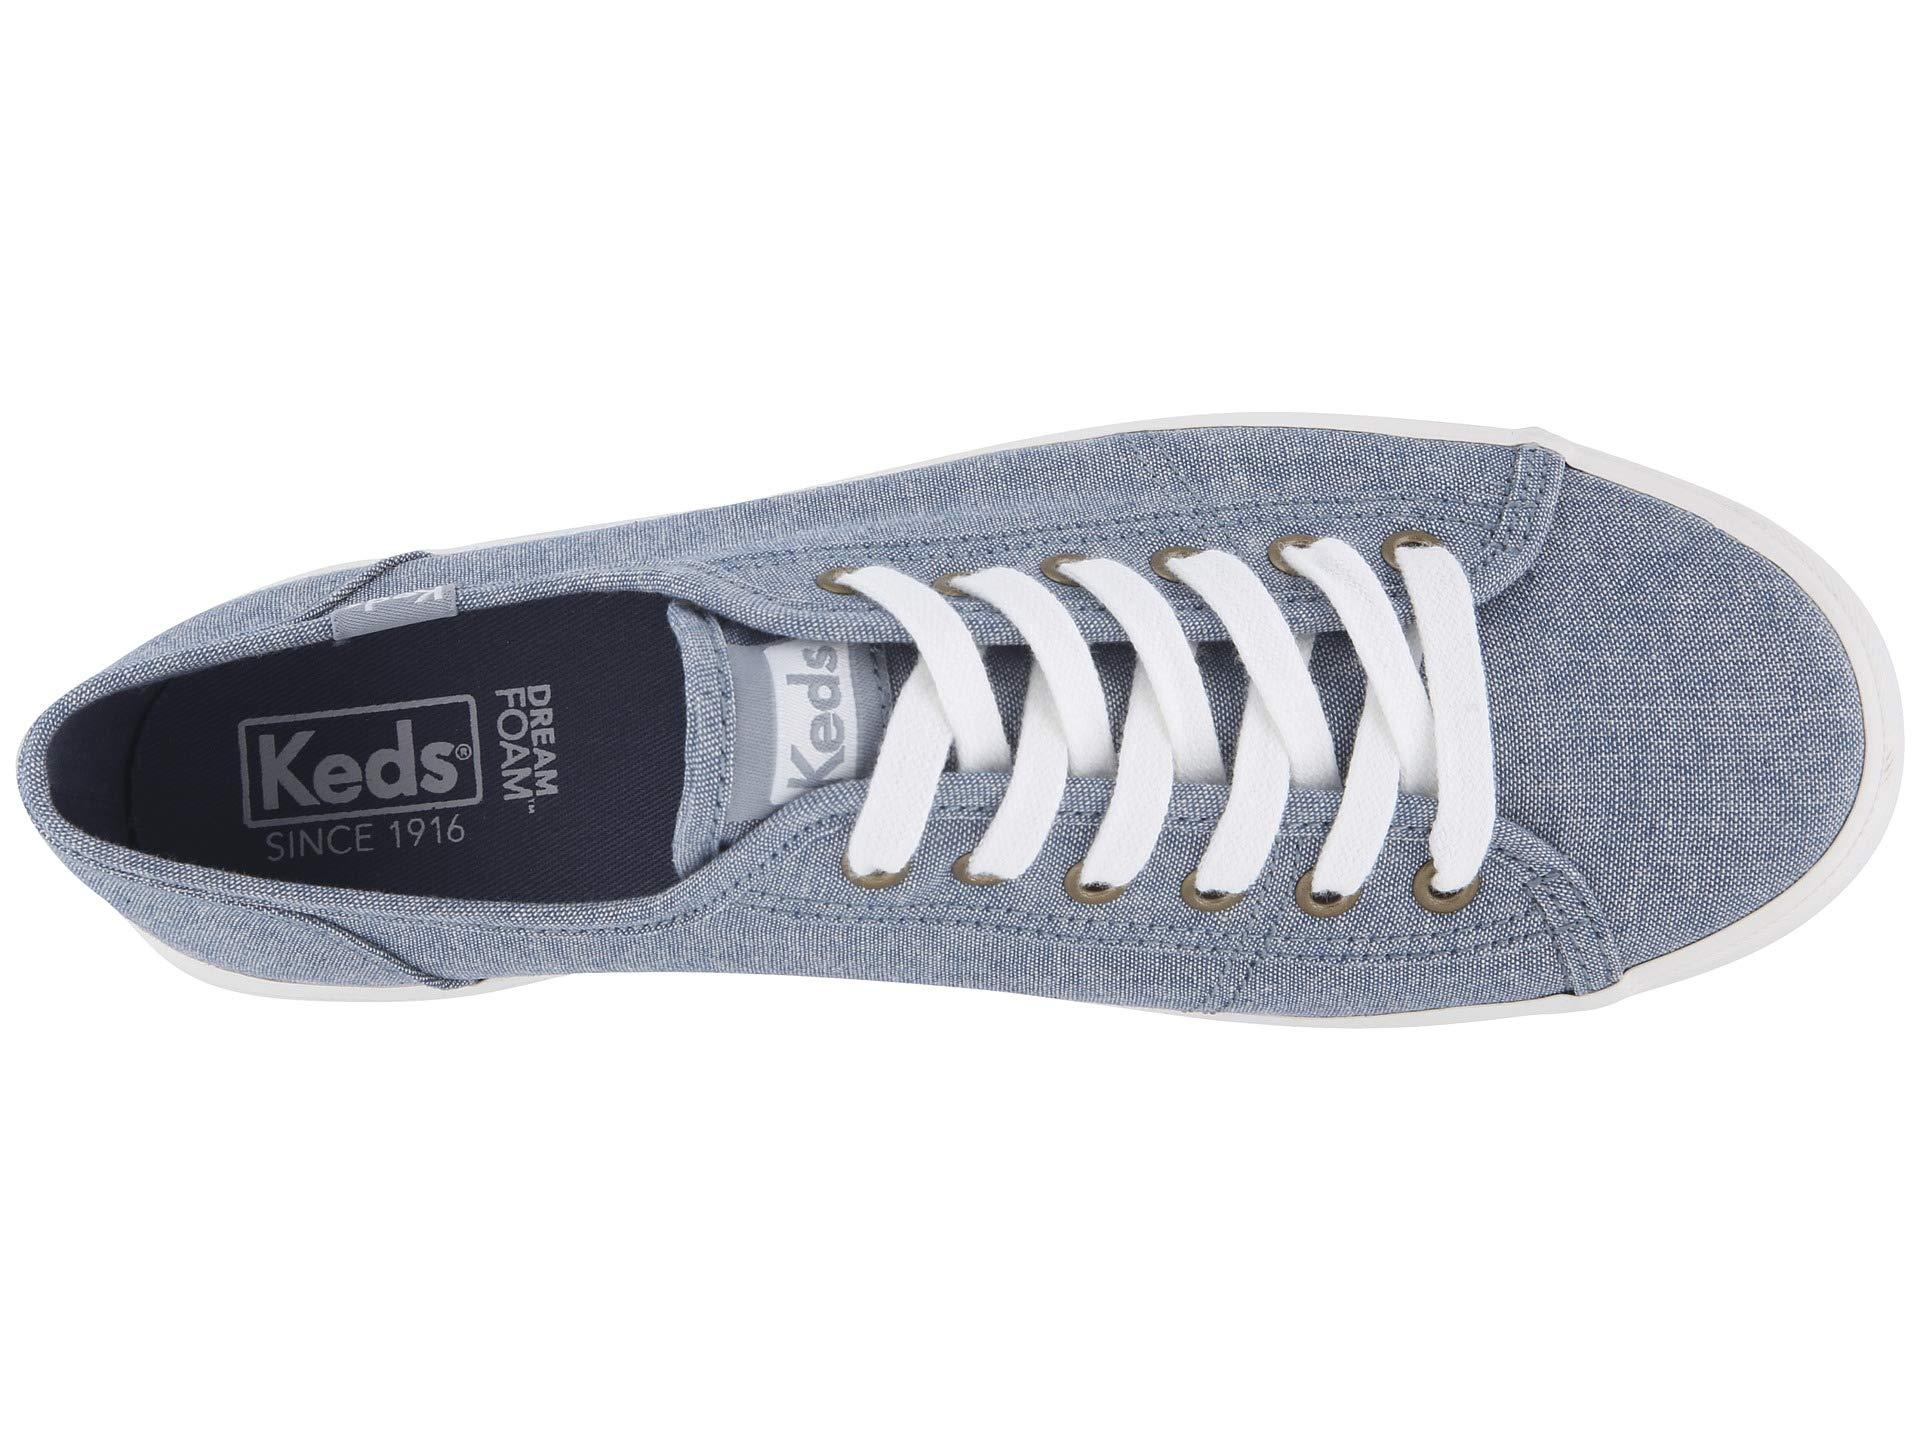 Keds Chambray Keds Kickstart Kickstart Blue 6vvnwg4qxH